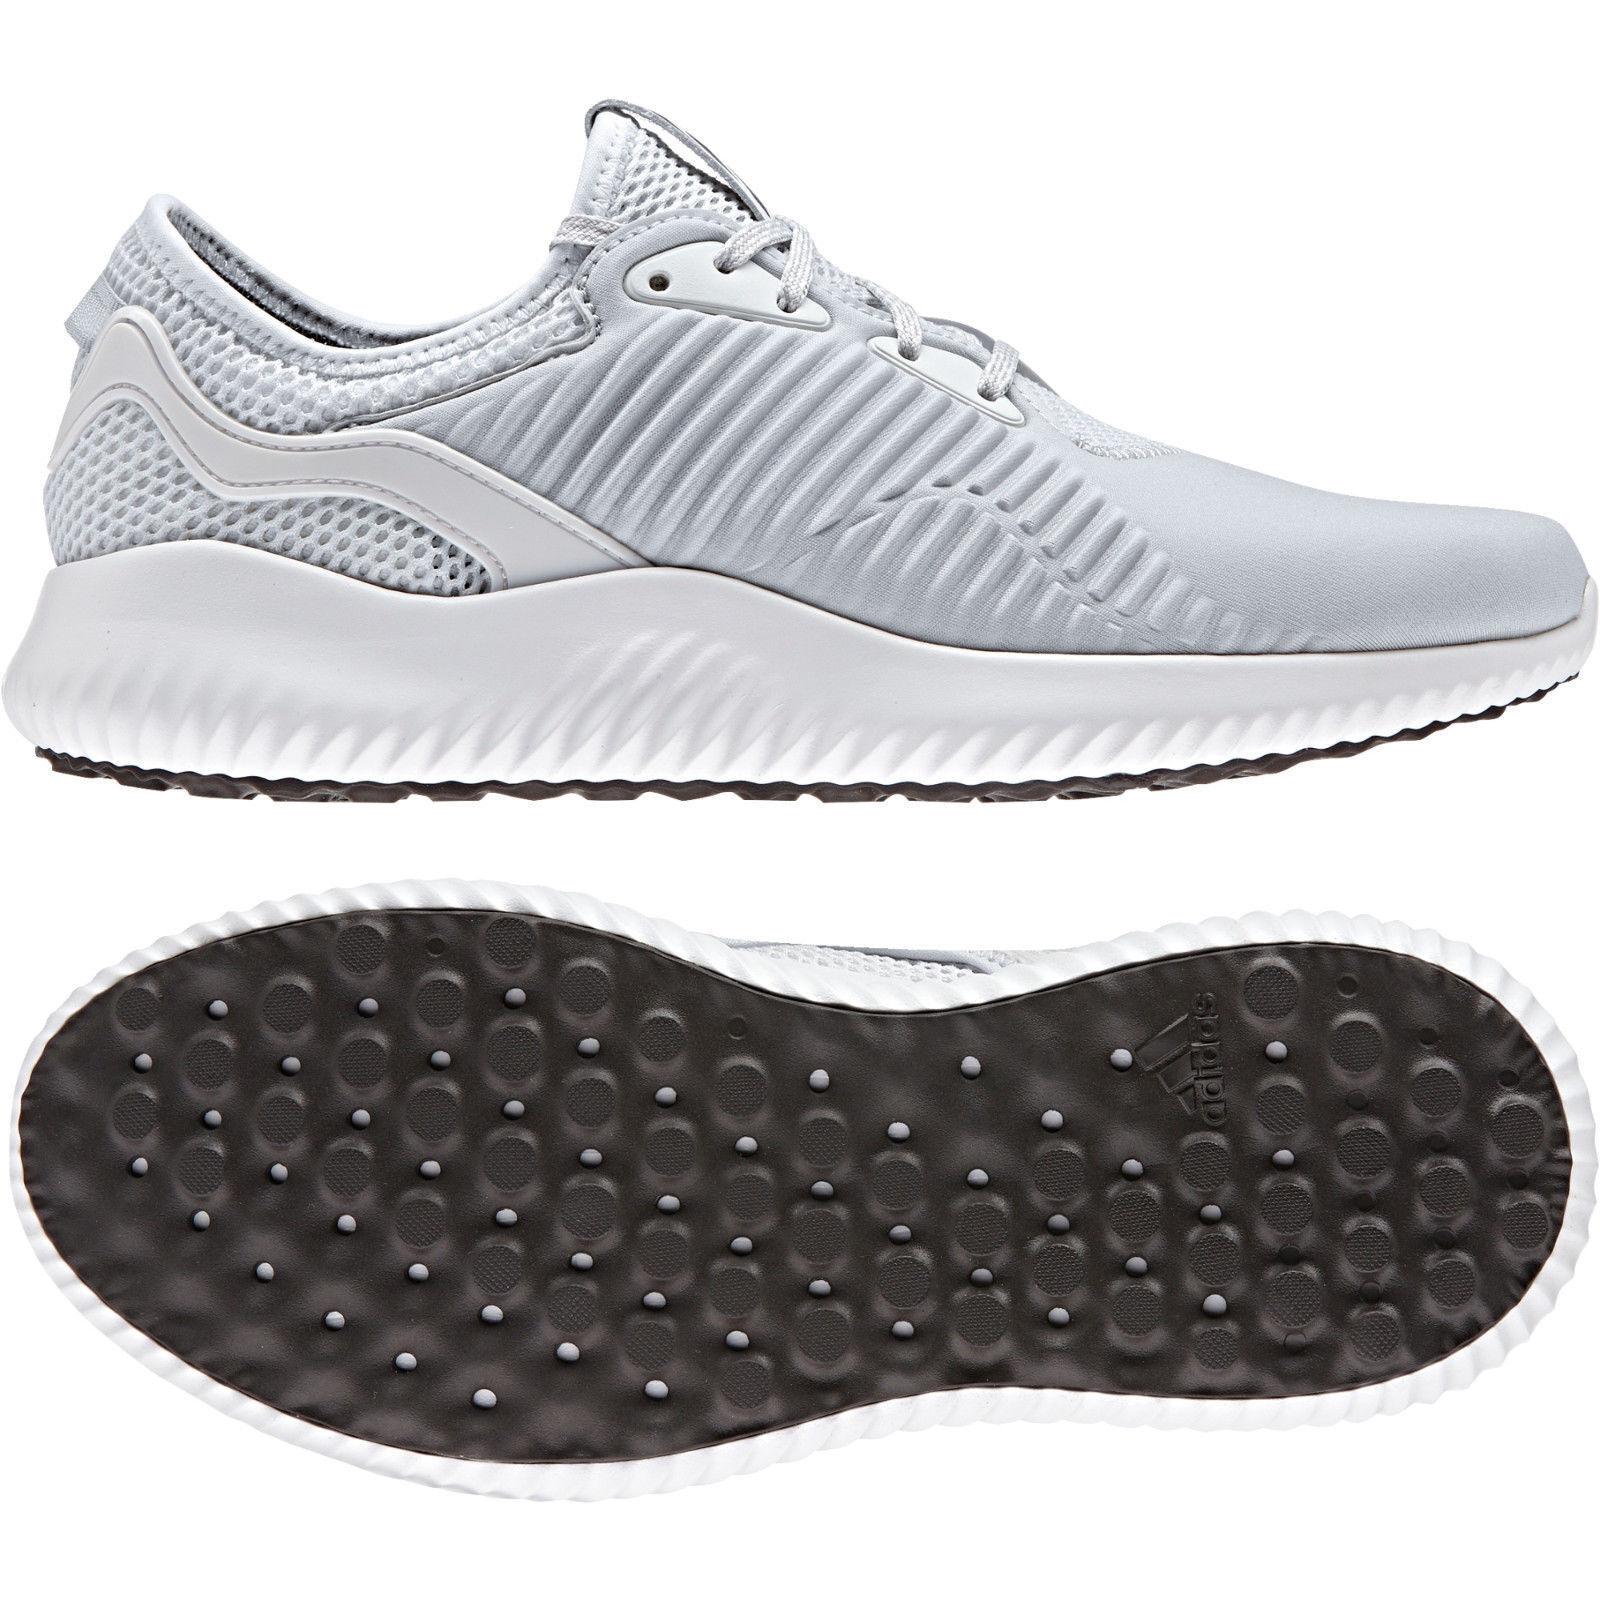 Adidas Women Running Running Running shoes Alphabounce Lux Bounce Training Gym B39271 White New 52f917